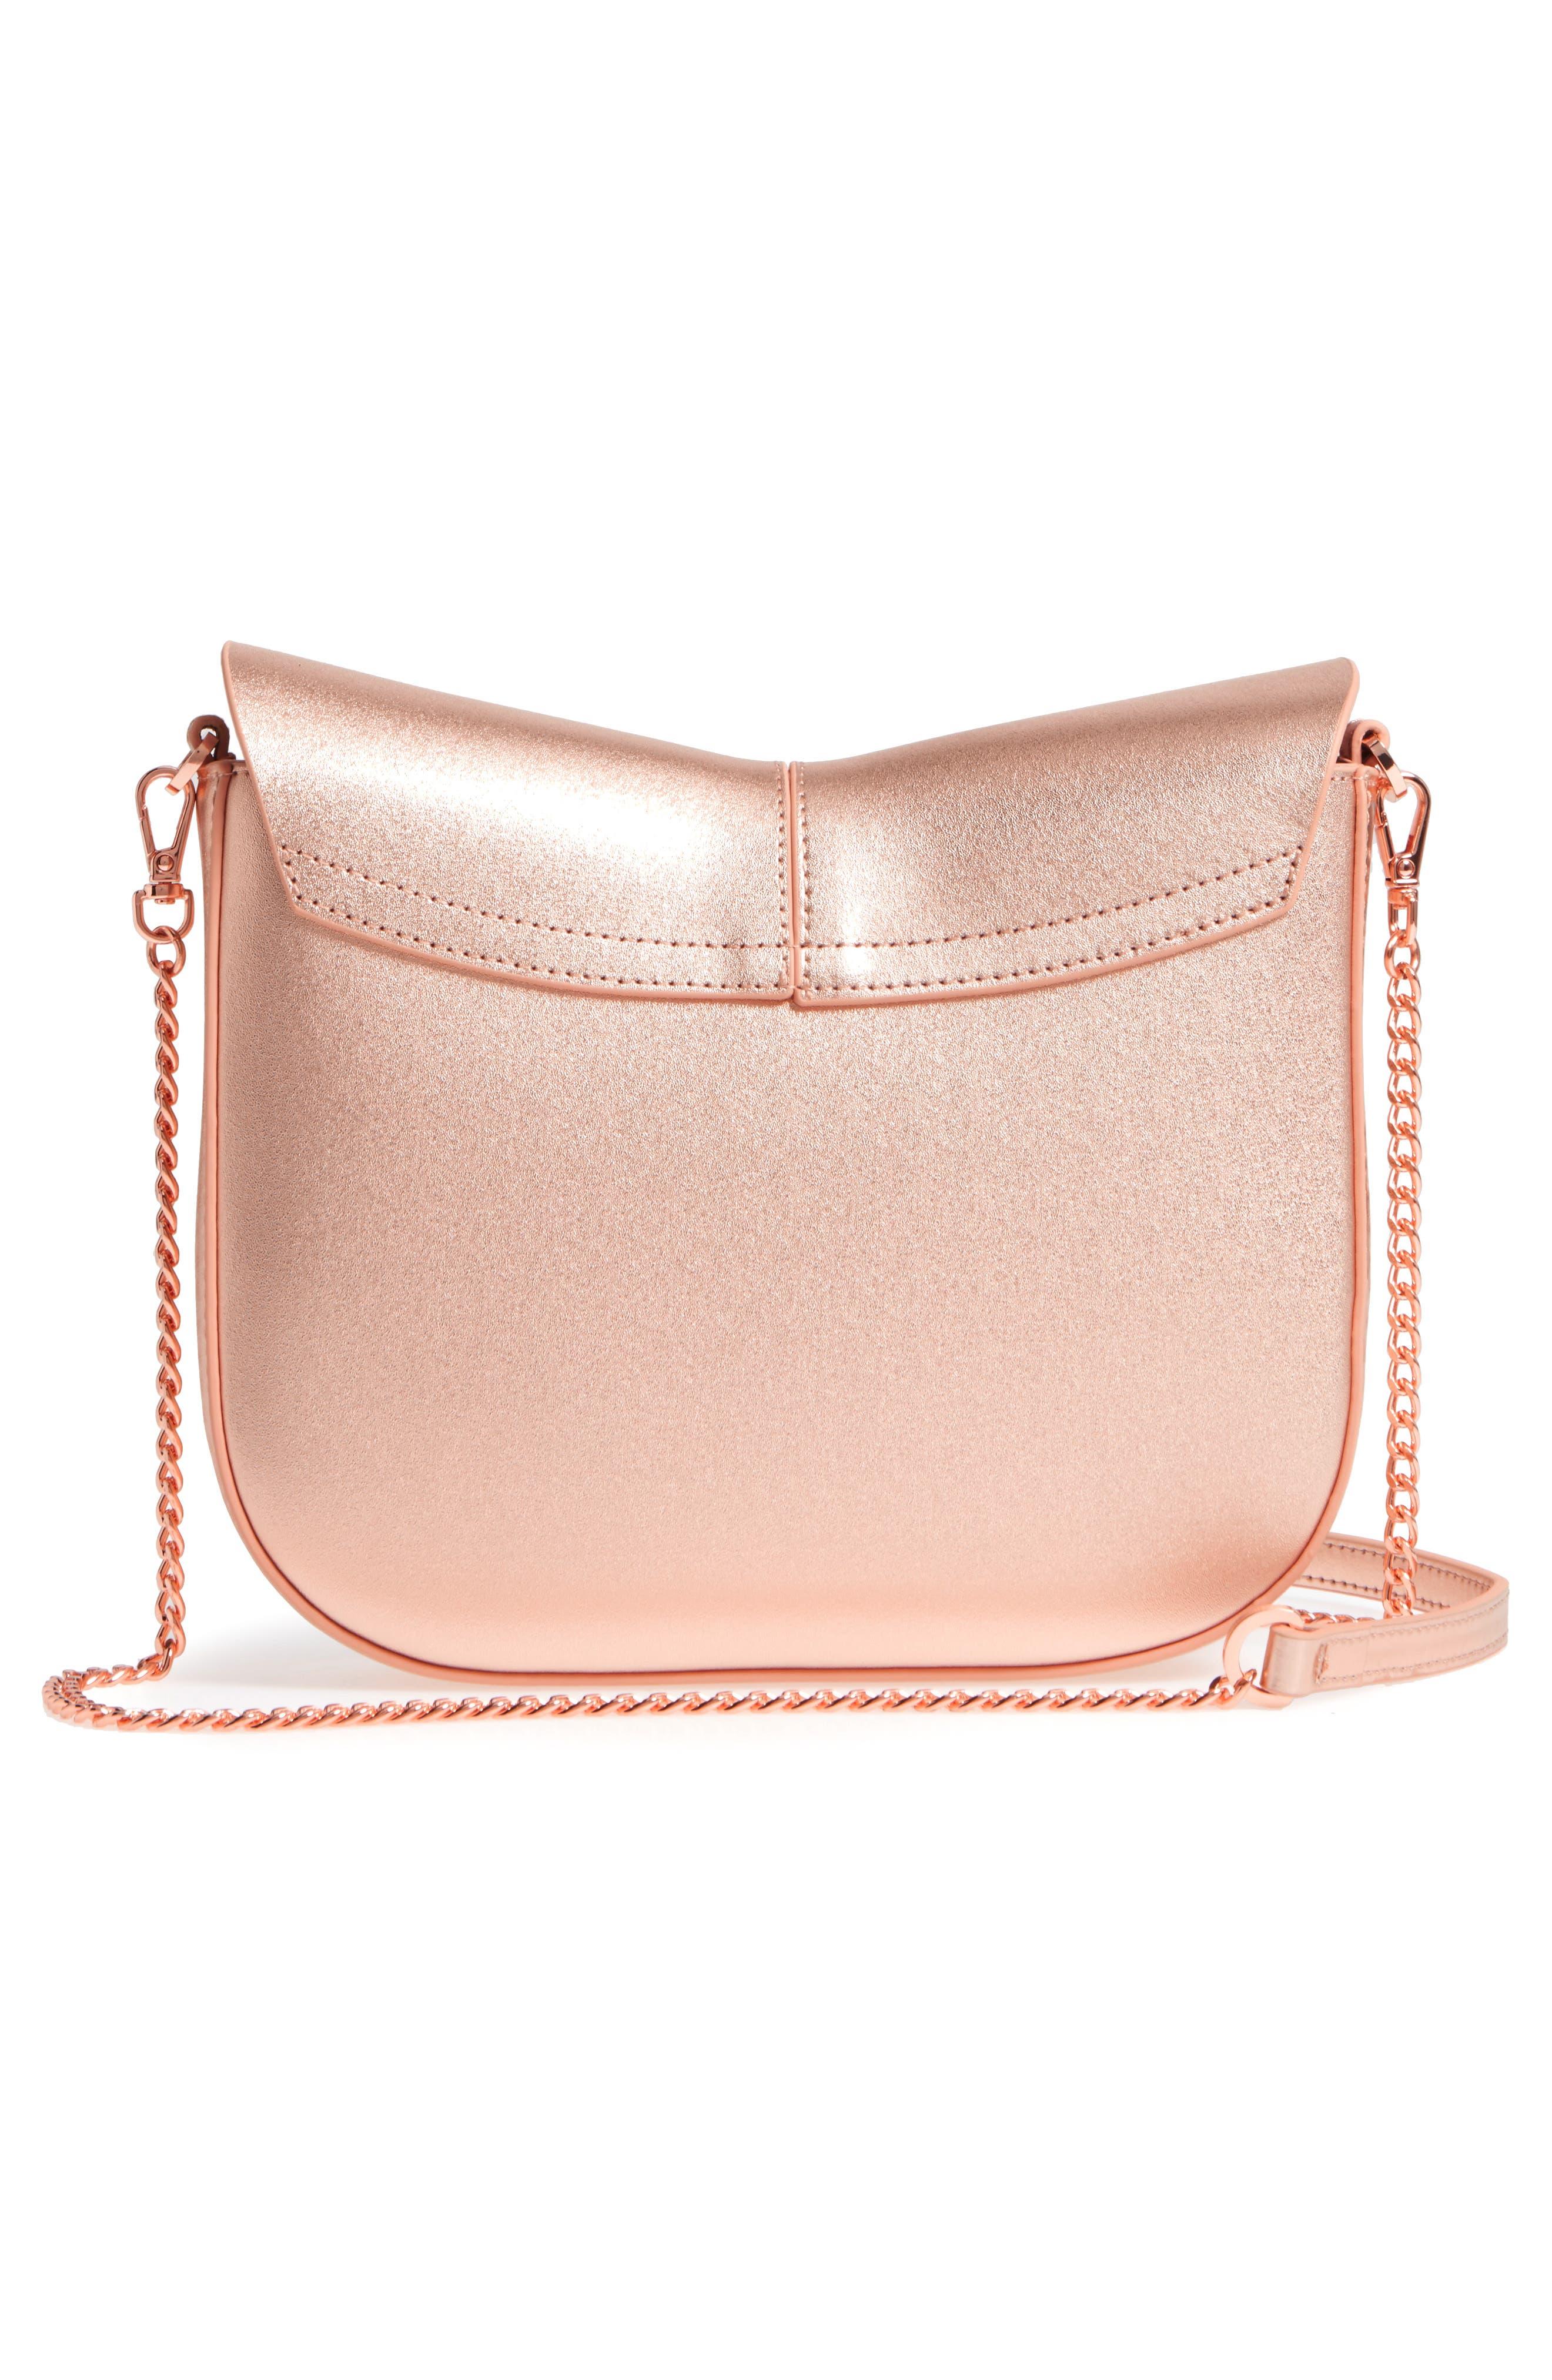 Kittii Cat Leather Crossbody Bag,                             Alternate thumbnail 3, color,                             Rose Gold